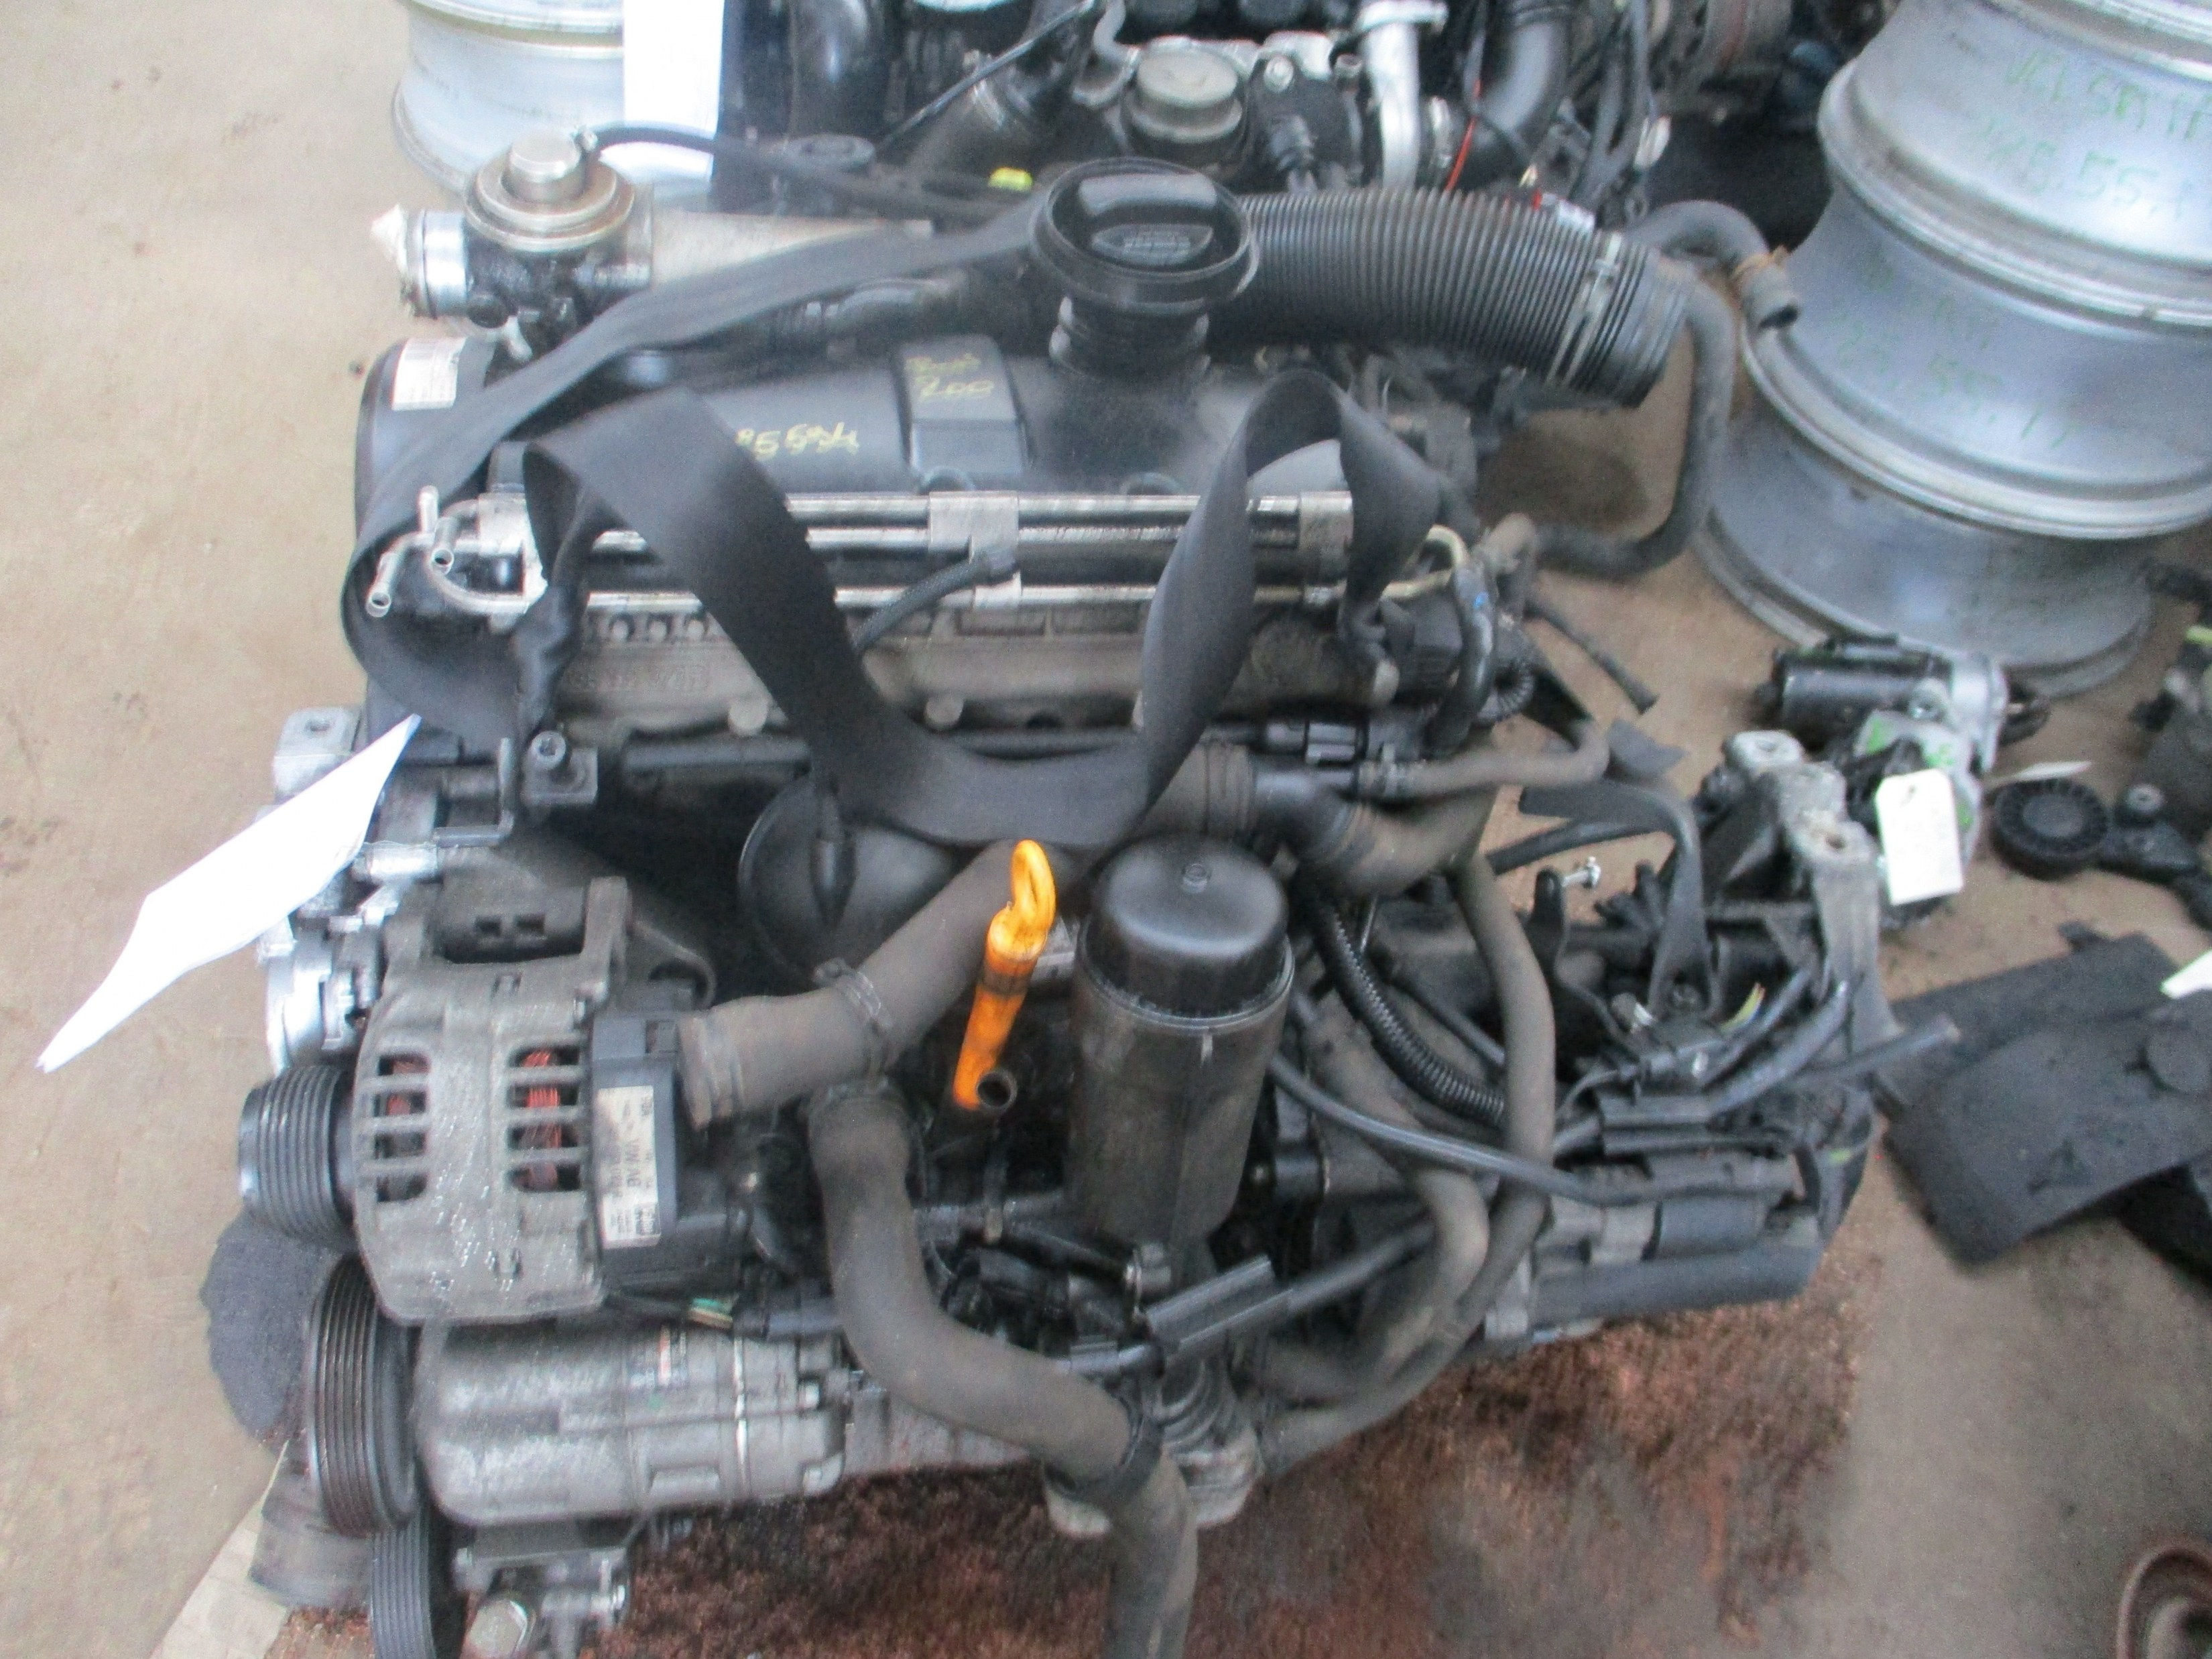 MOTEUR TWINGO II 1500 DCI 64 CV